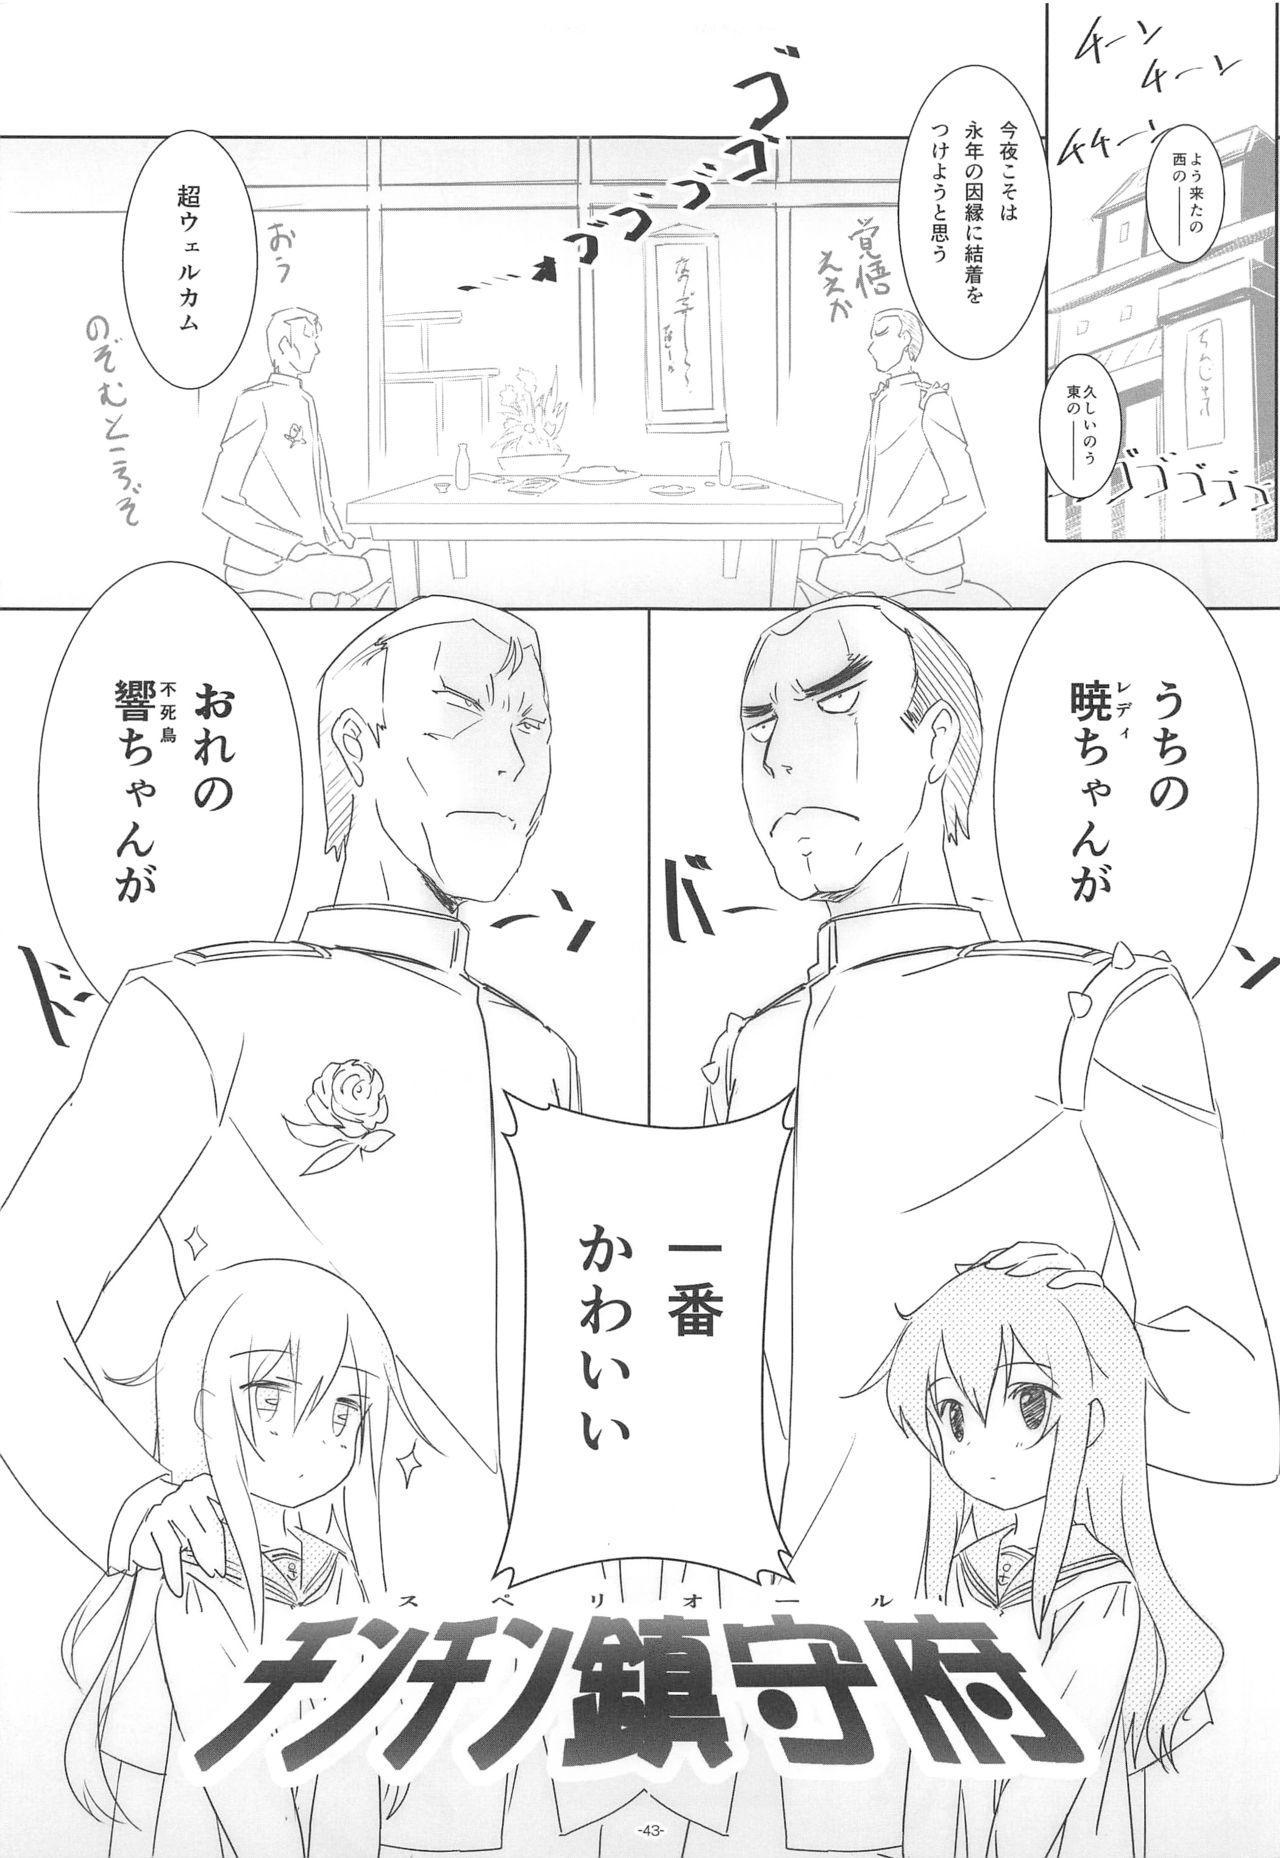 Korokoro-Manman II Korokoro:P Soushuuhen II 41